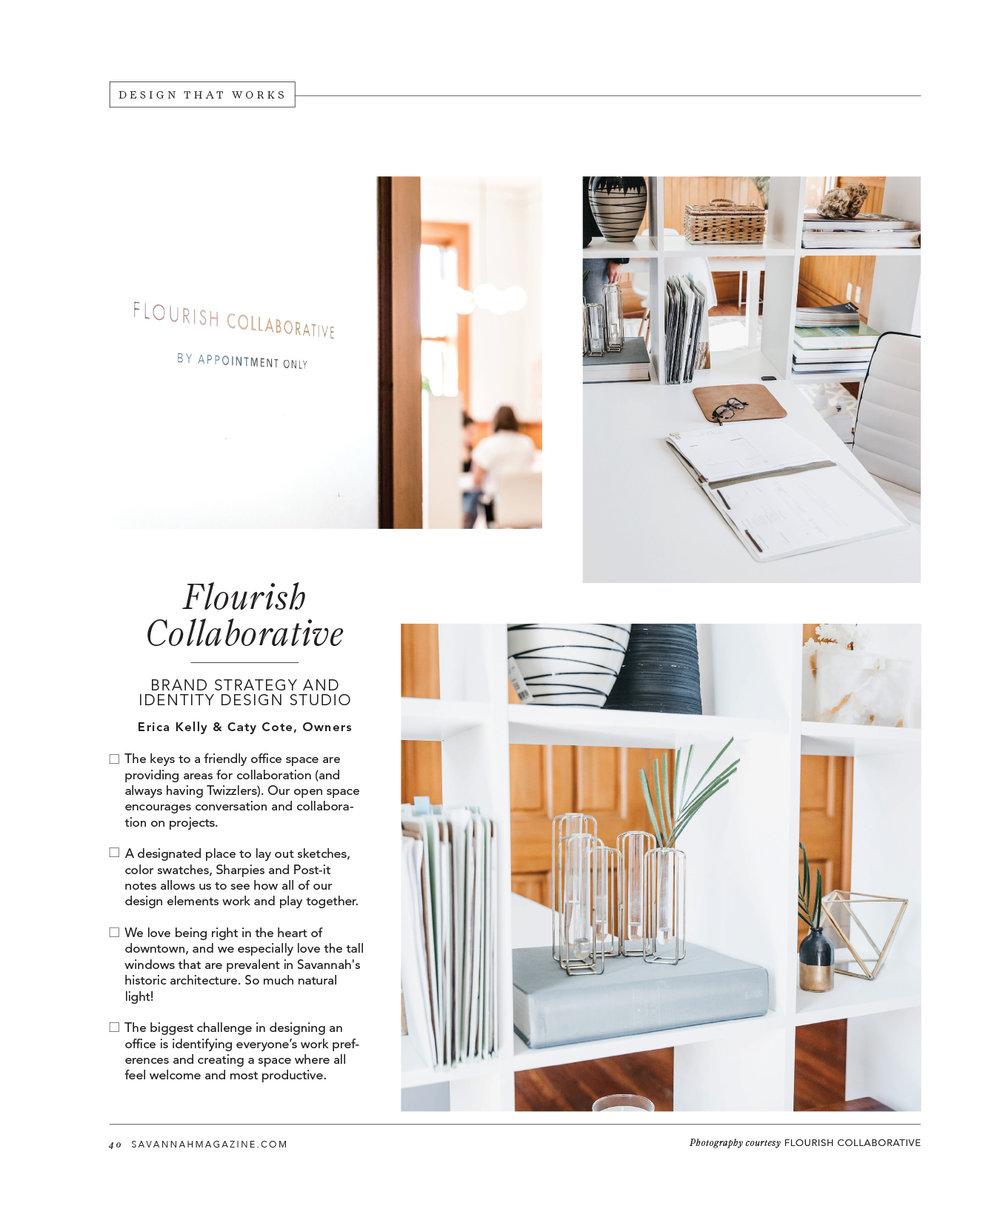 Flourish-Collaborative-Savannah-Magazine-Homes-Spring-2019-page2.jpg